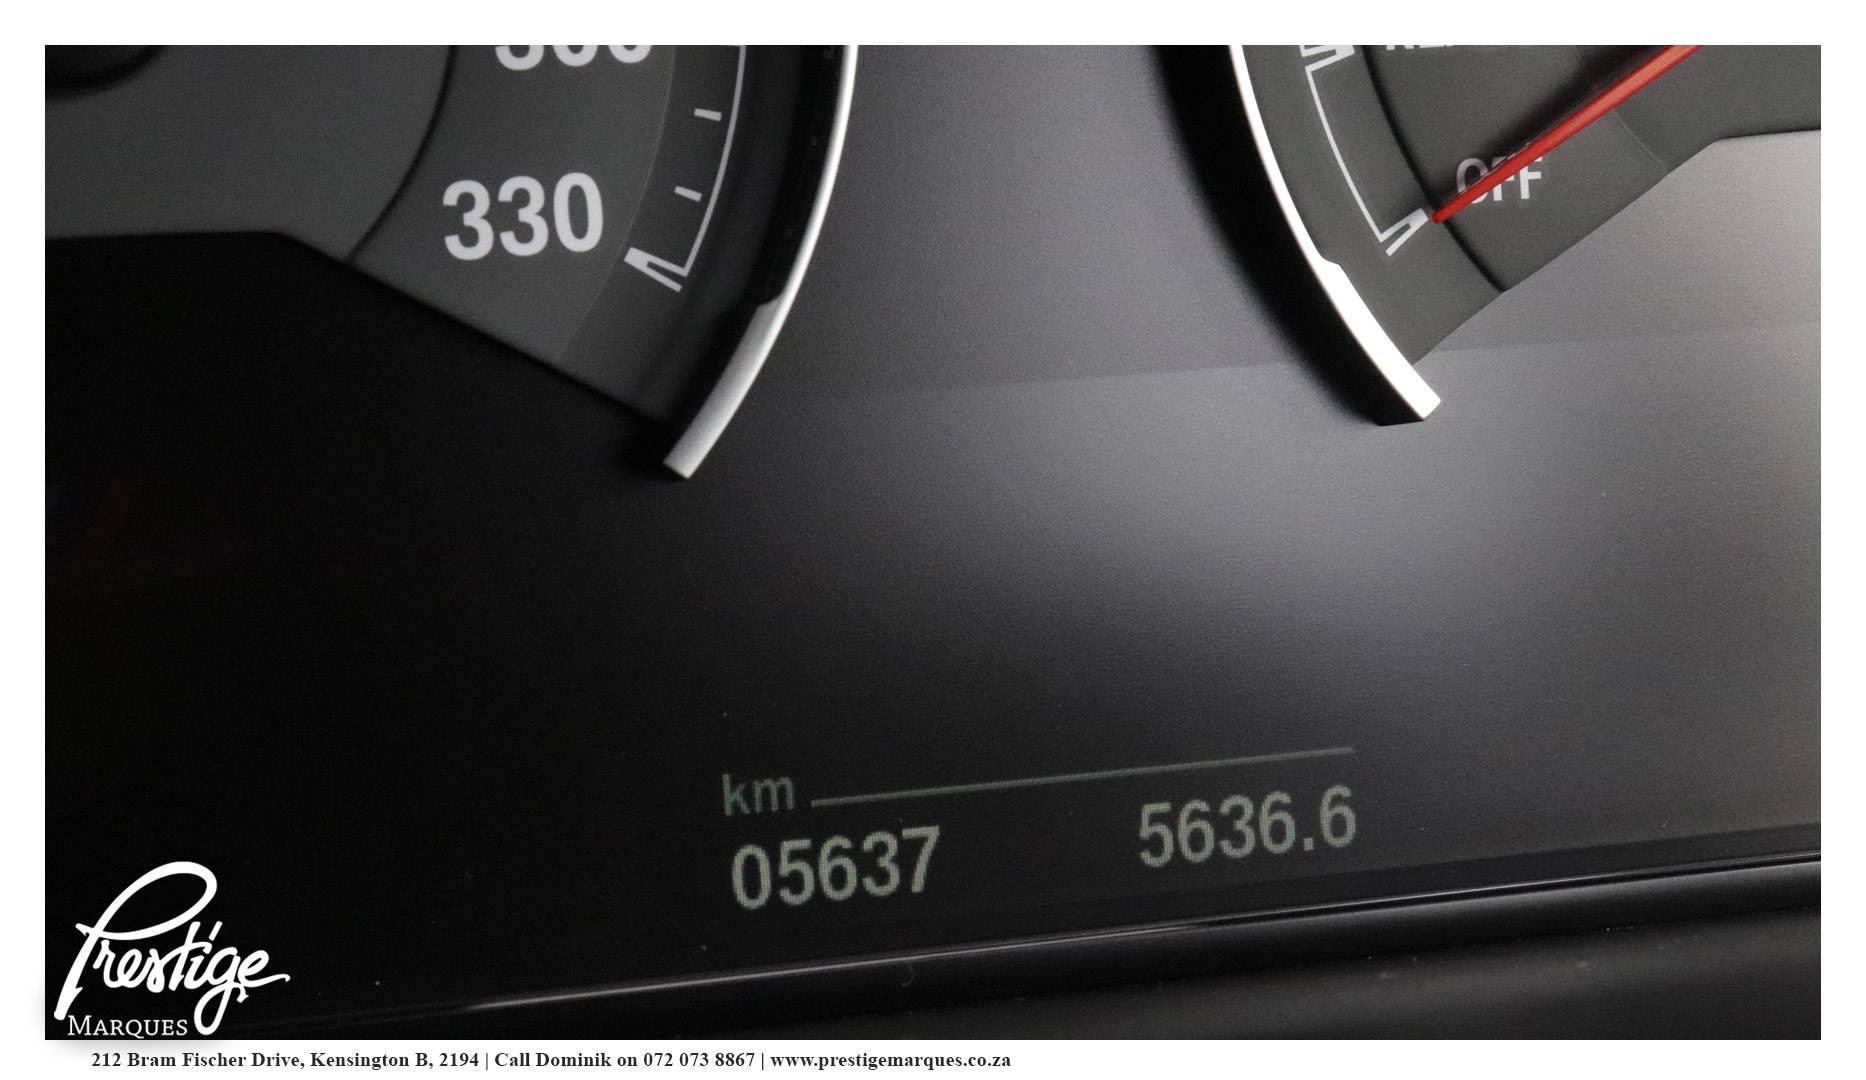 2015-BMW-M4-Coupe-Blue-Prestige-Marques-Randburg-Sandton-16